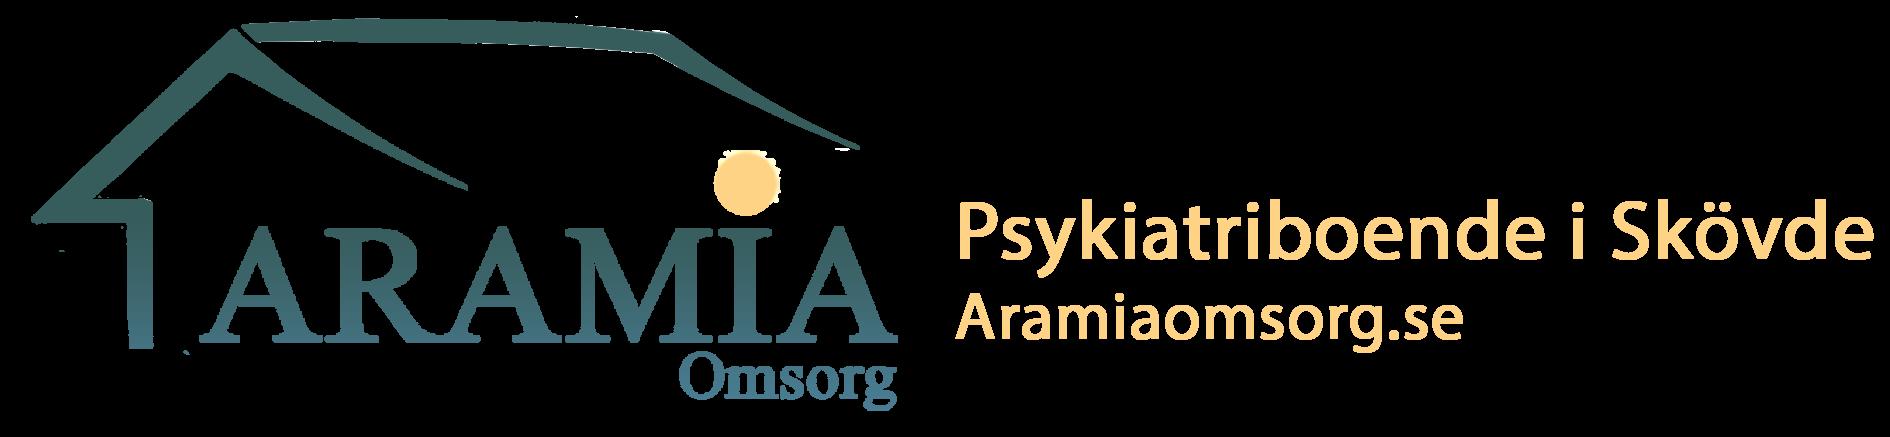 Aramia Omsorg